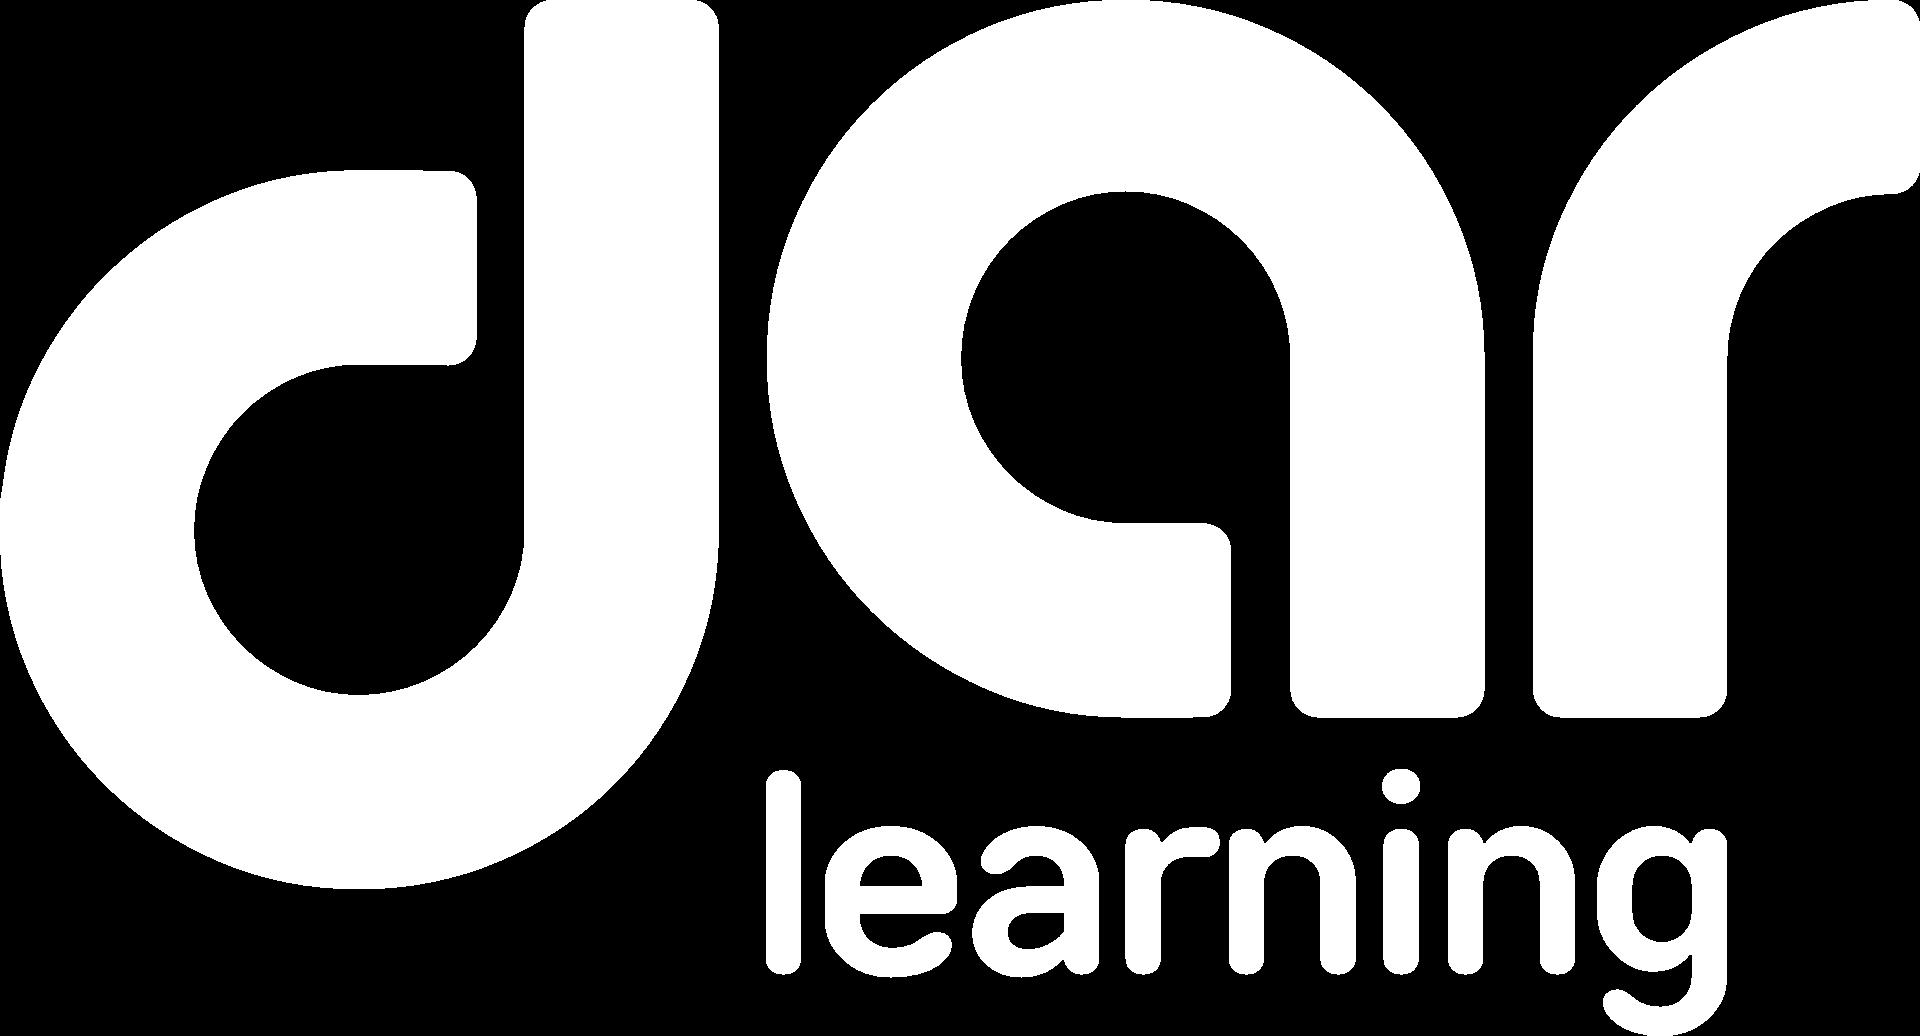 Darlearning